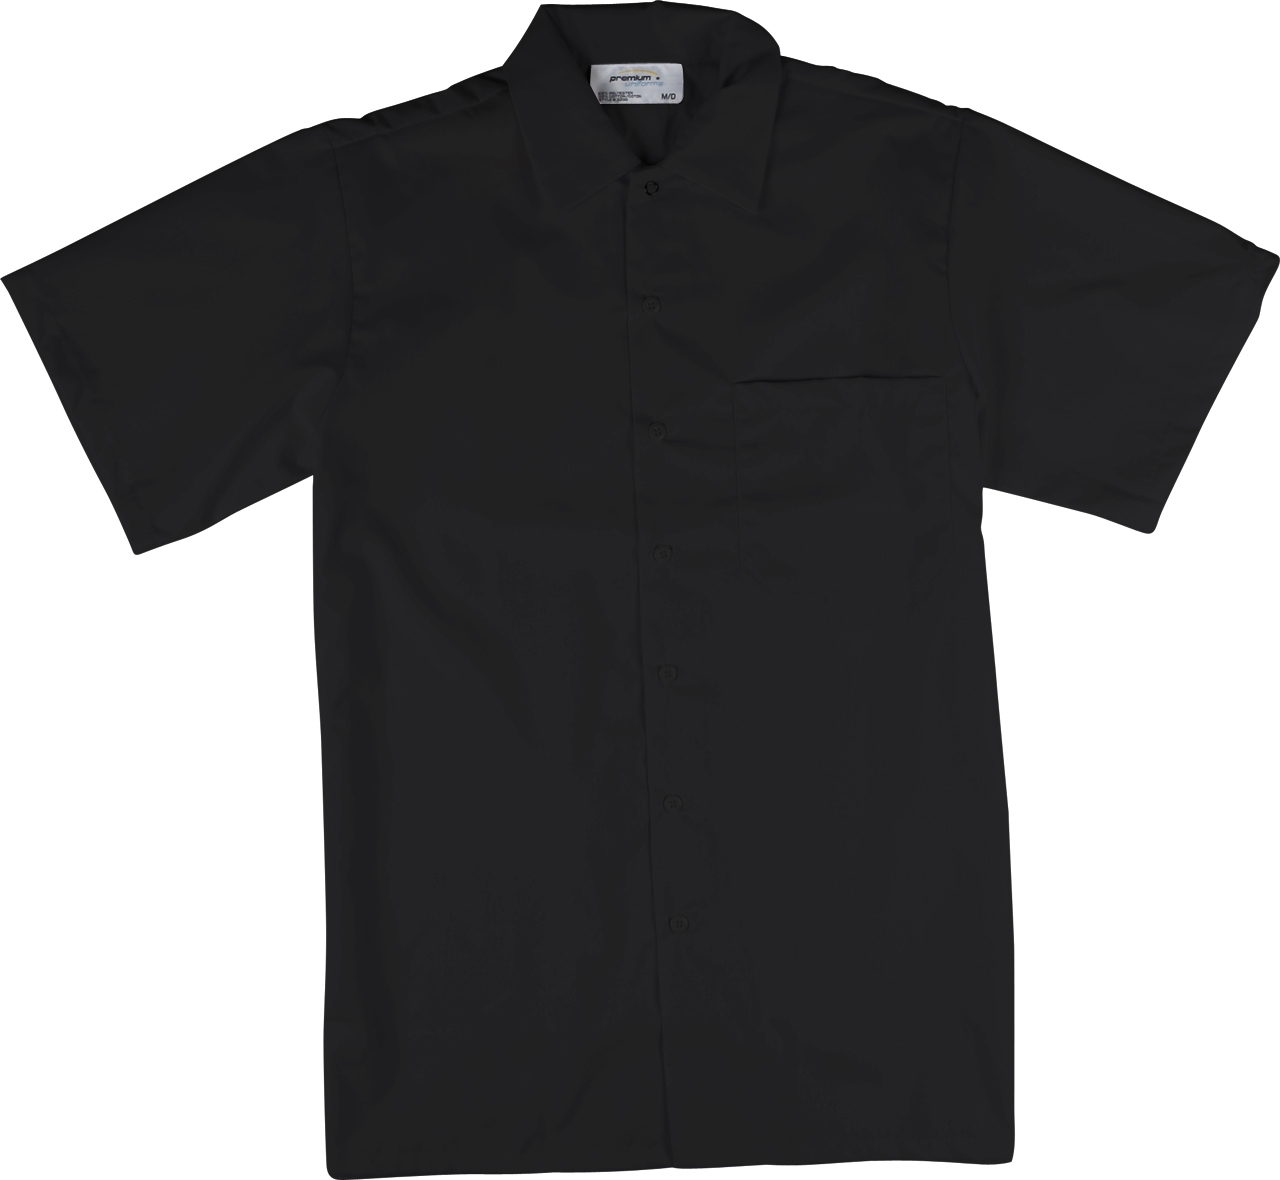 Picture of Premium Uniforms Cook Shirt